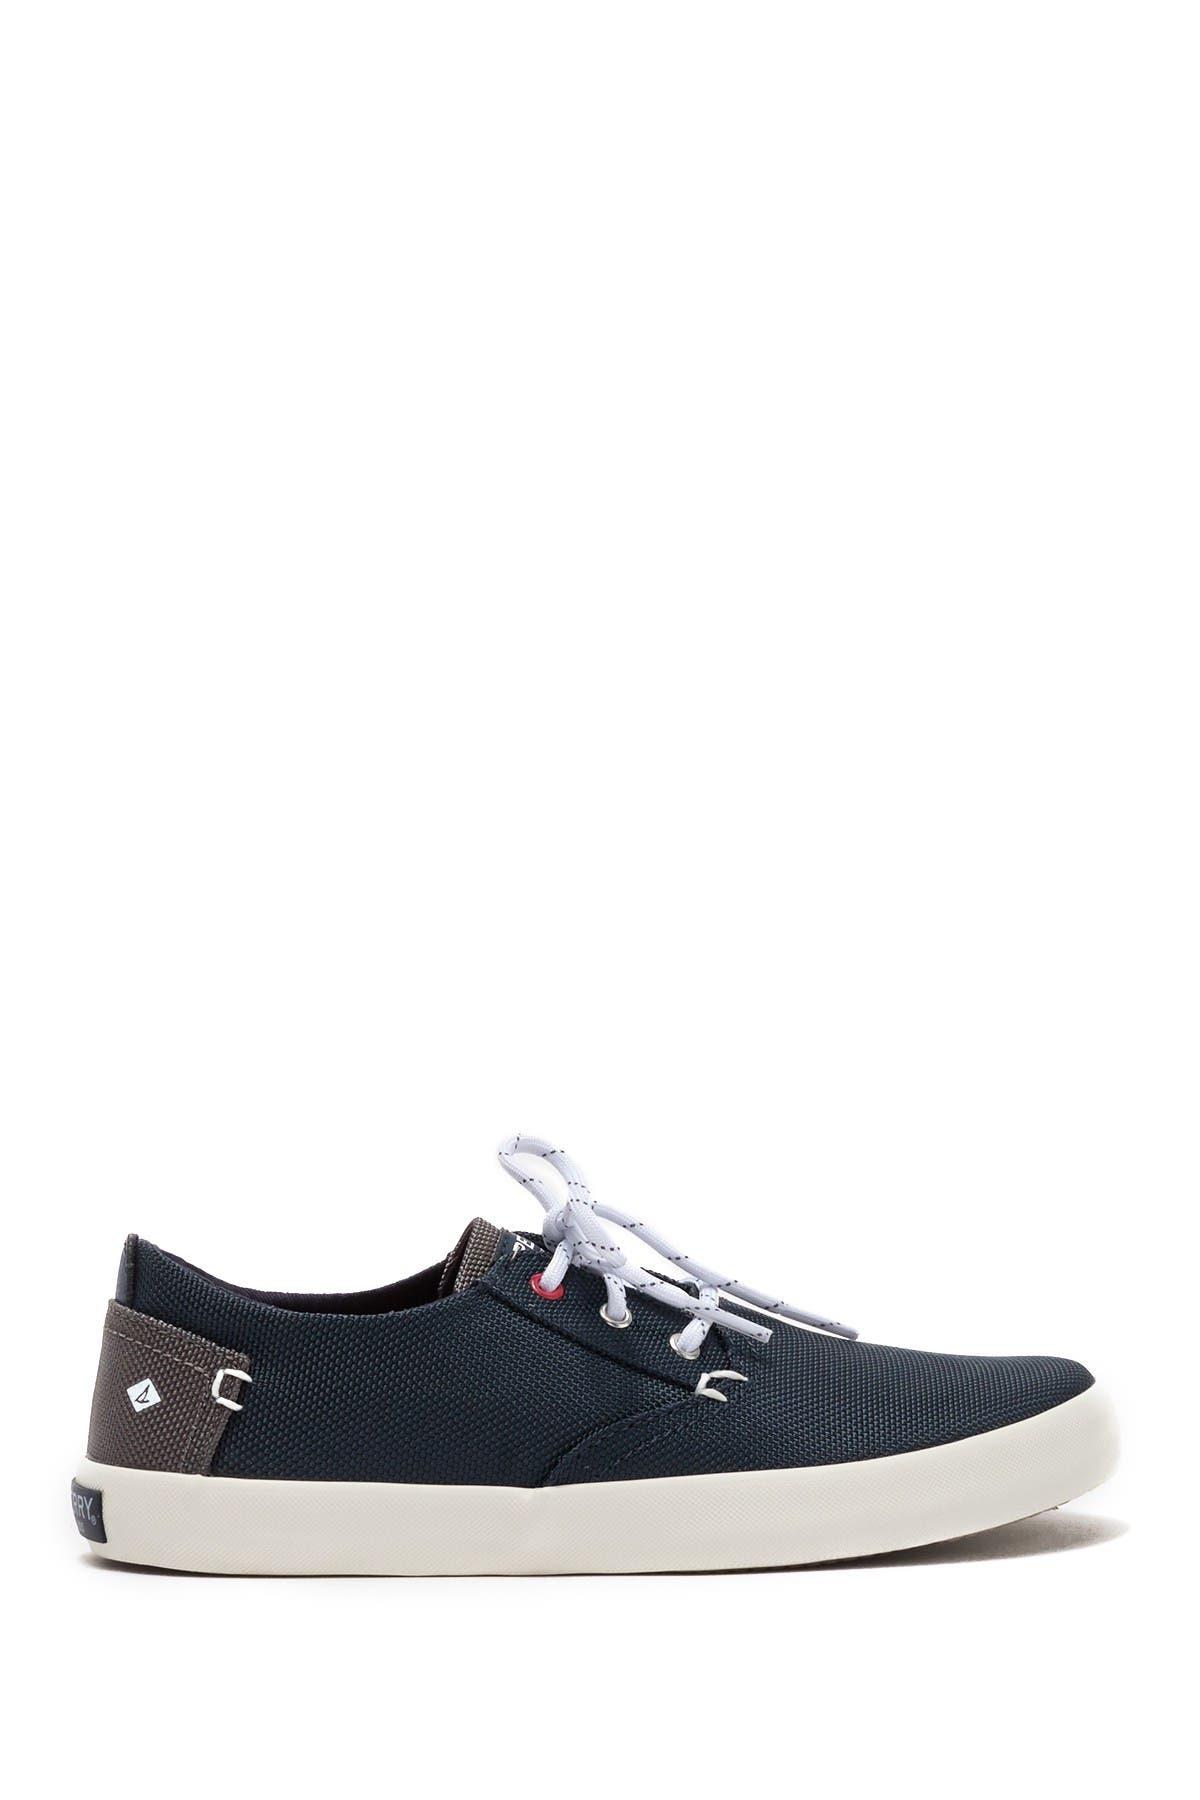 Sperry Bodie Sneaker